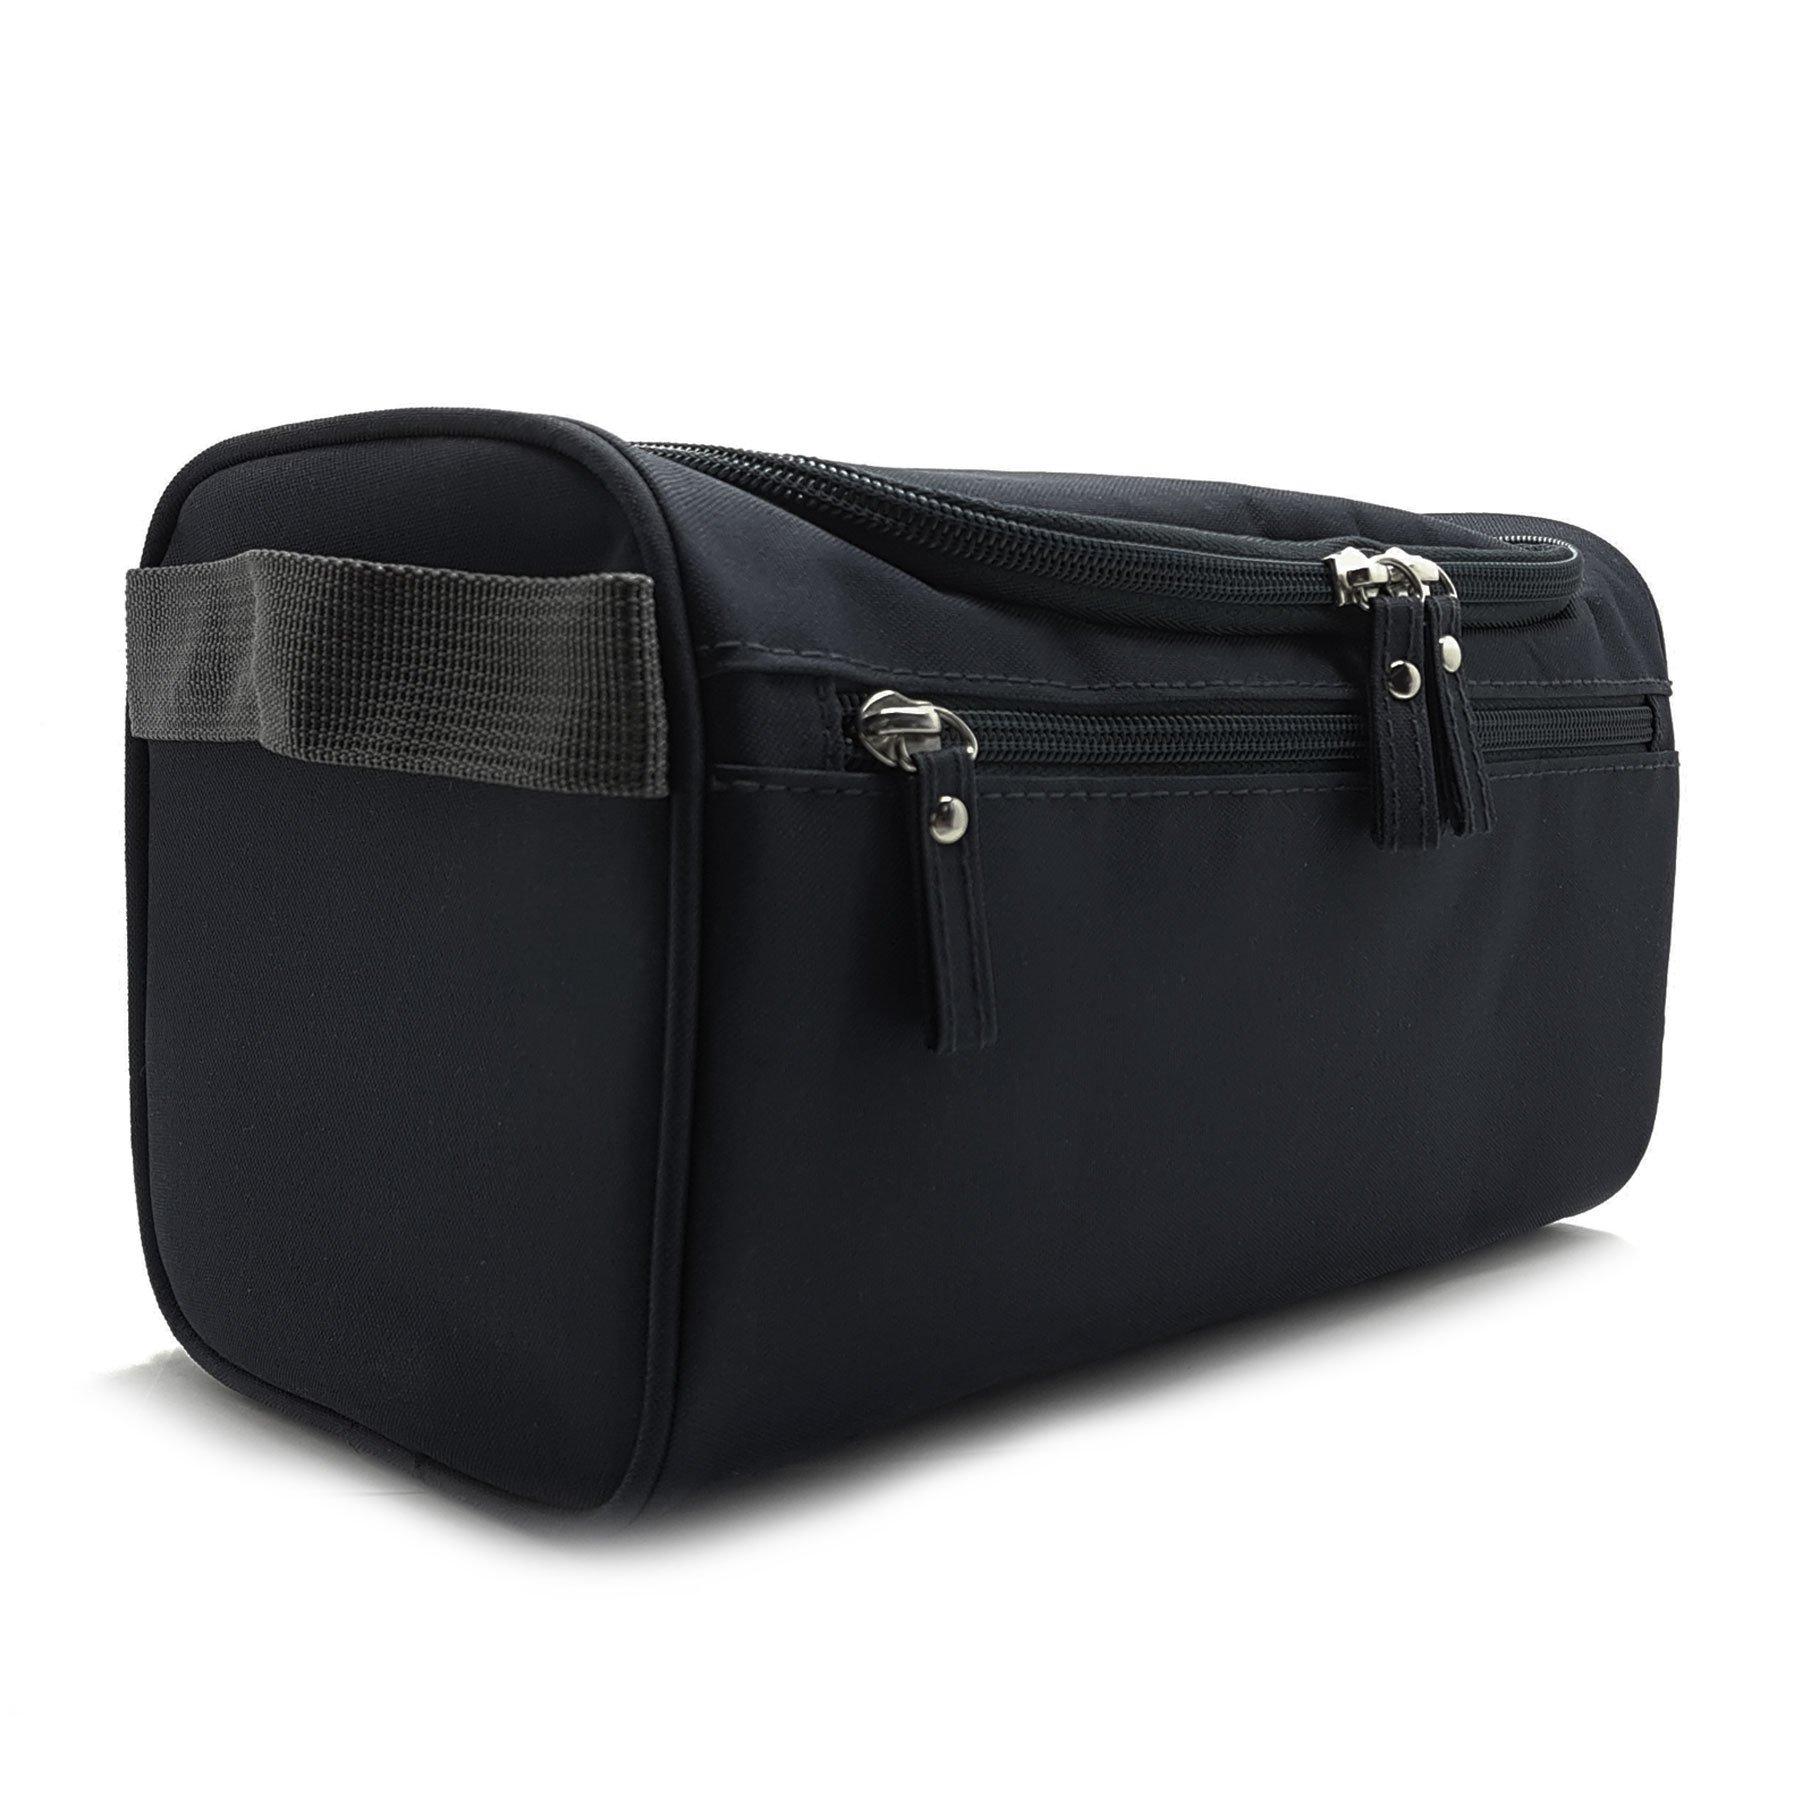 Mister Bag Toiletry Bag Hanging Travel Toiletries Bag, Black